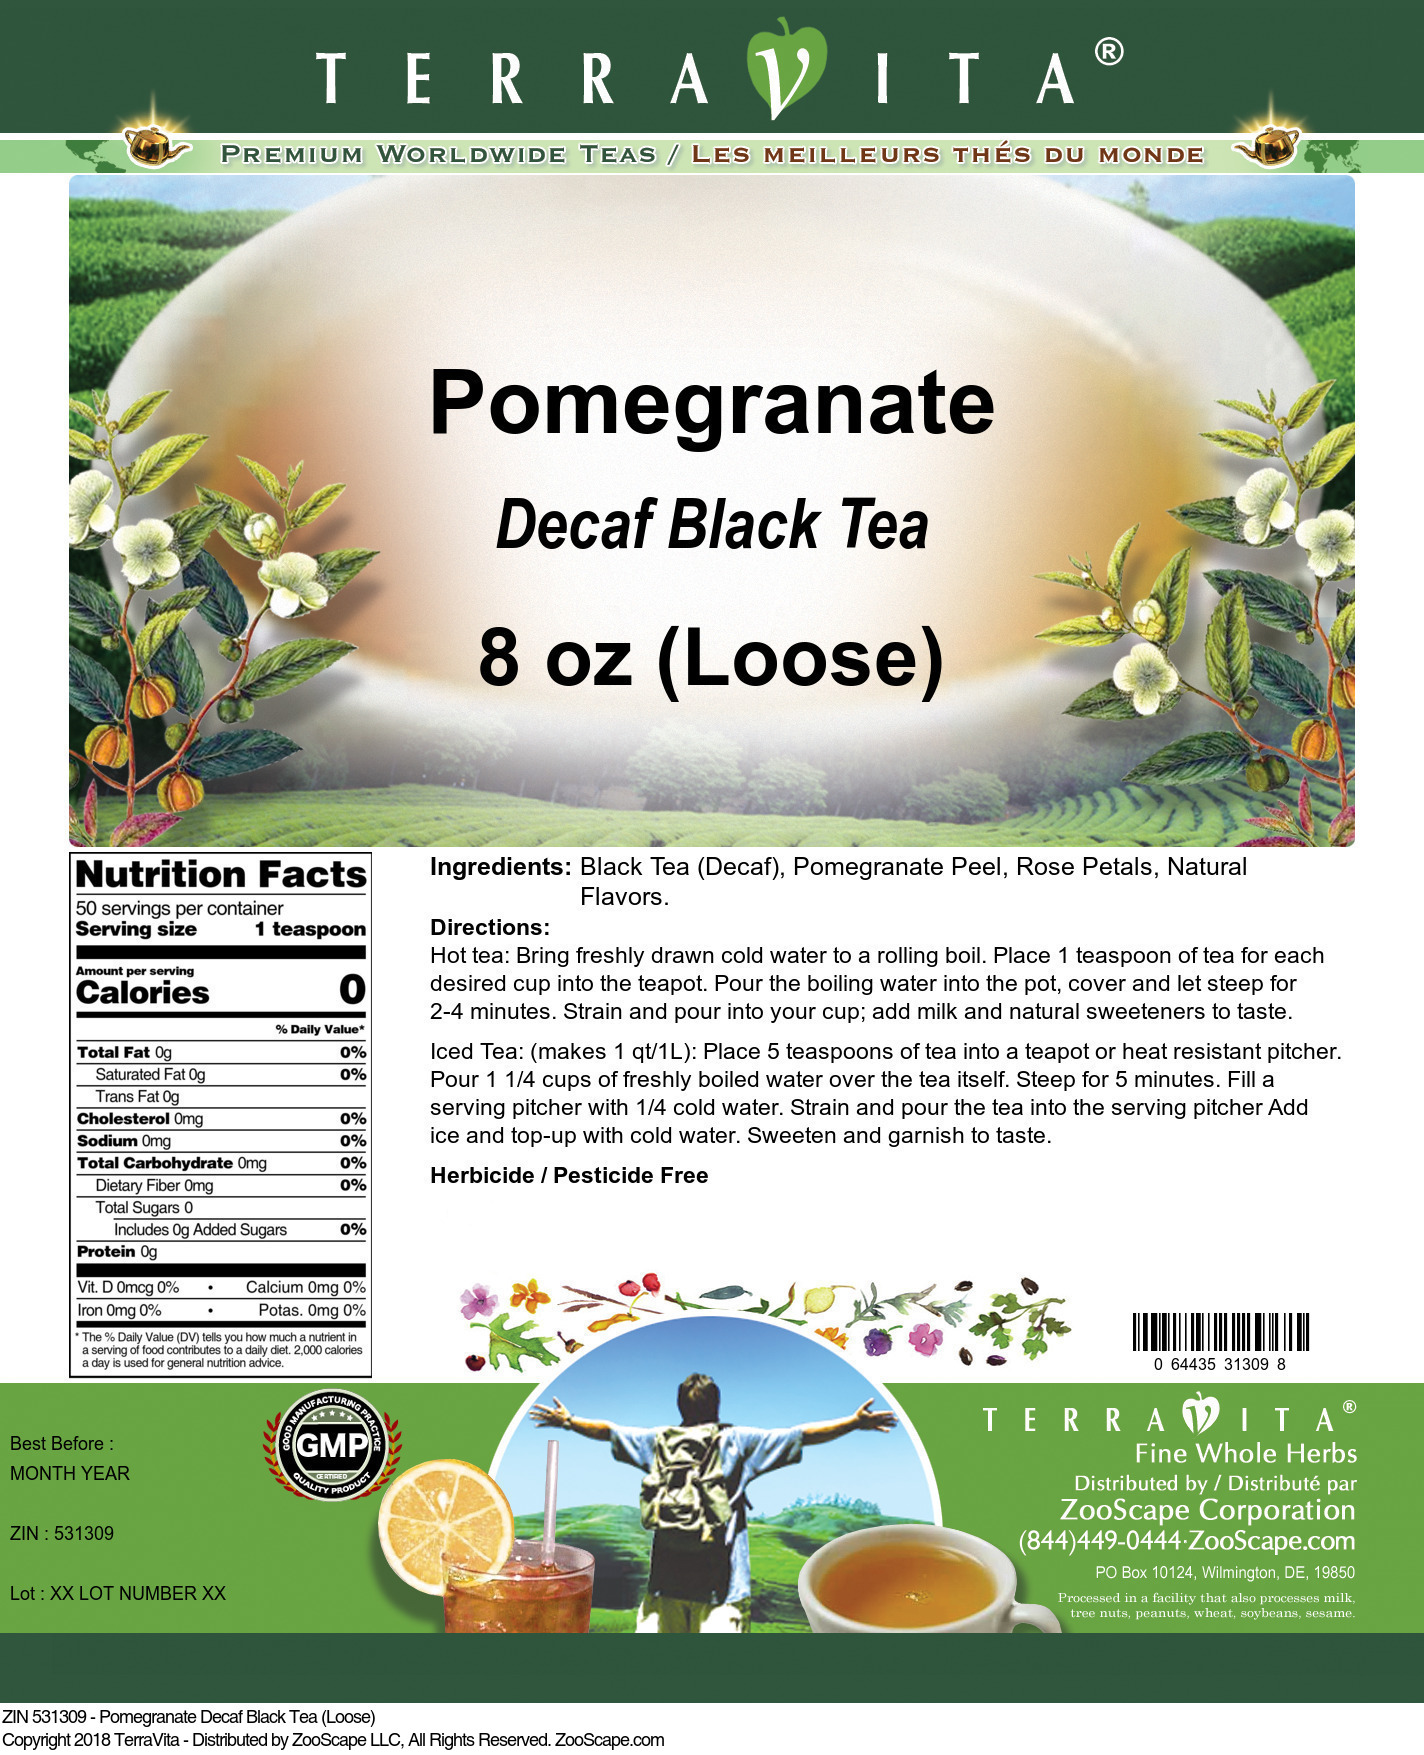 Pomegranate Decaf Black Tea